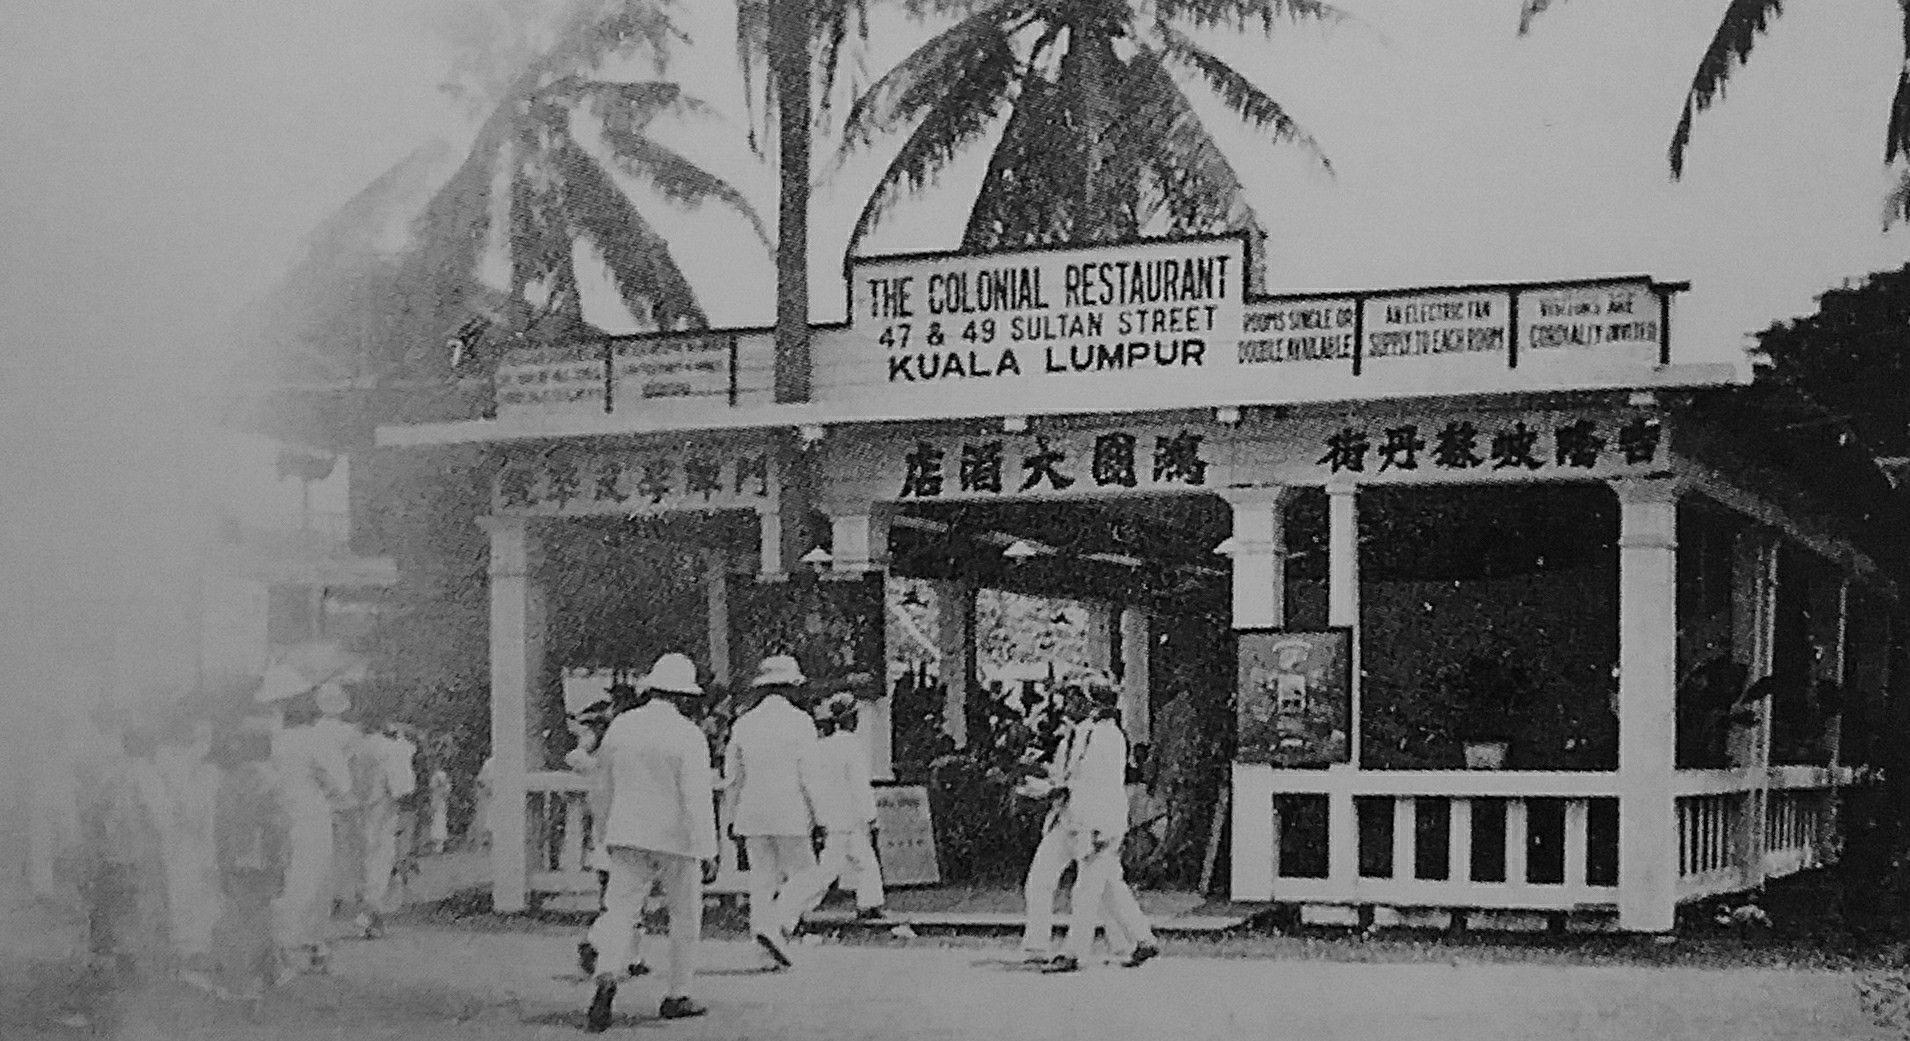 The Colonial Restaurant Sultan Street Kuala Lumpur C 1920s Image Via Arkib Negara Malaysia Kuala Lumpur Architecture Fashion Malaysia